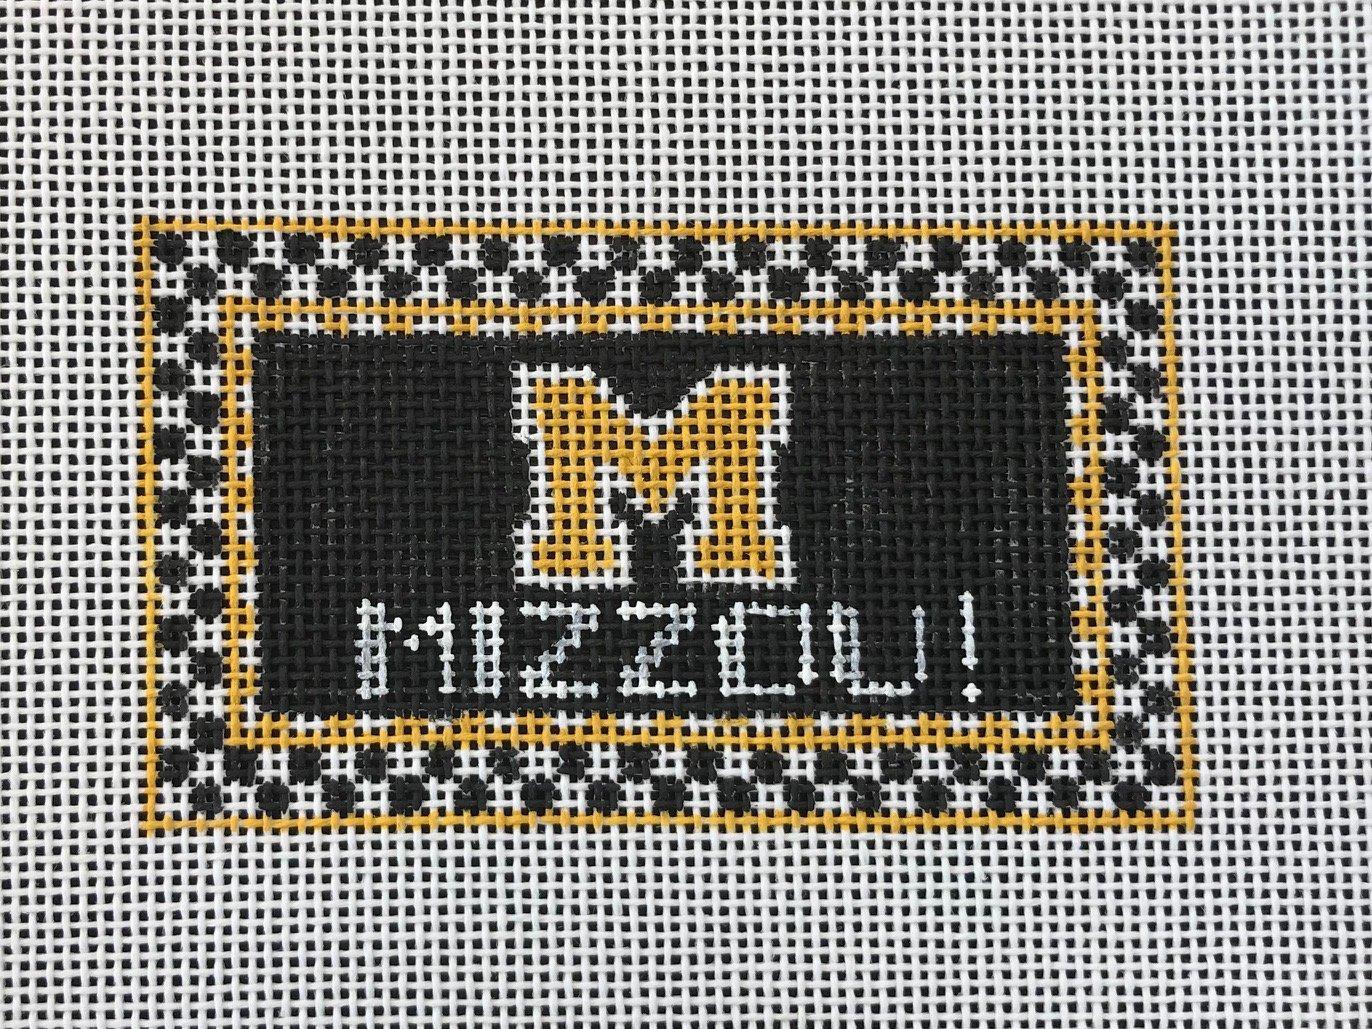 University of Missouri, Tiny Teams